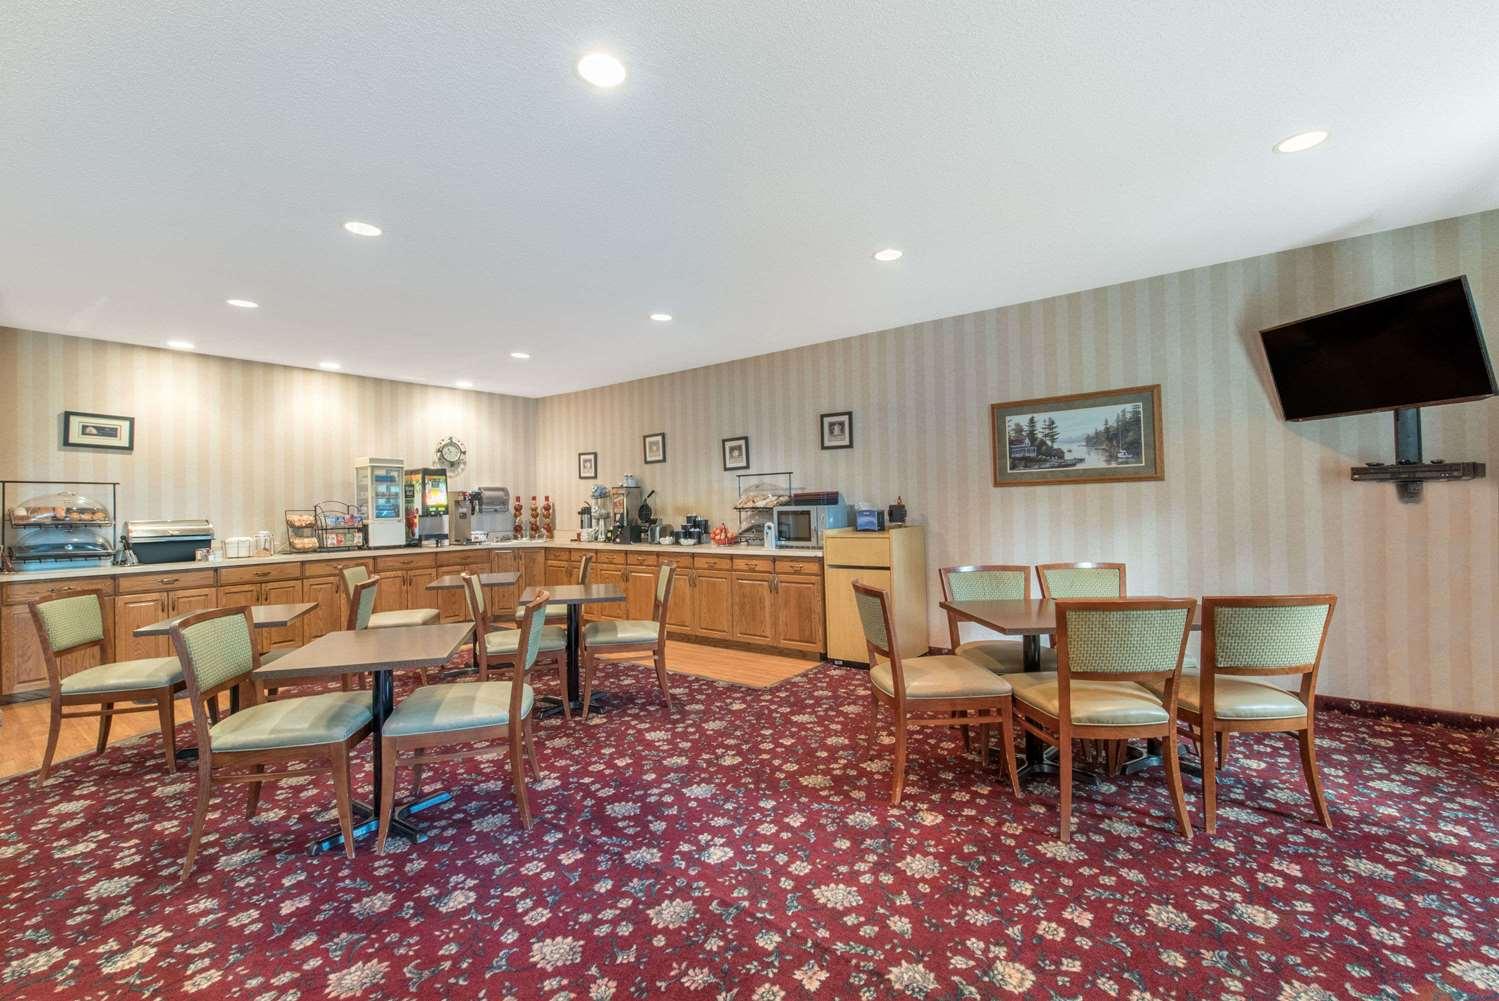 proam - Ramada Limited Hotel Northeast Bismarck